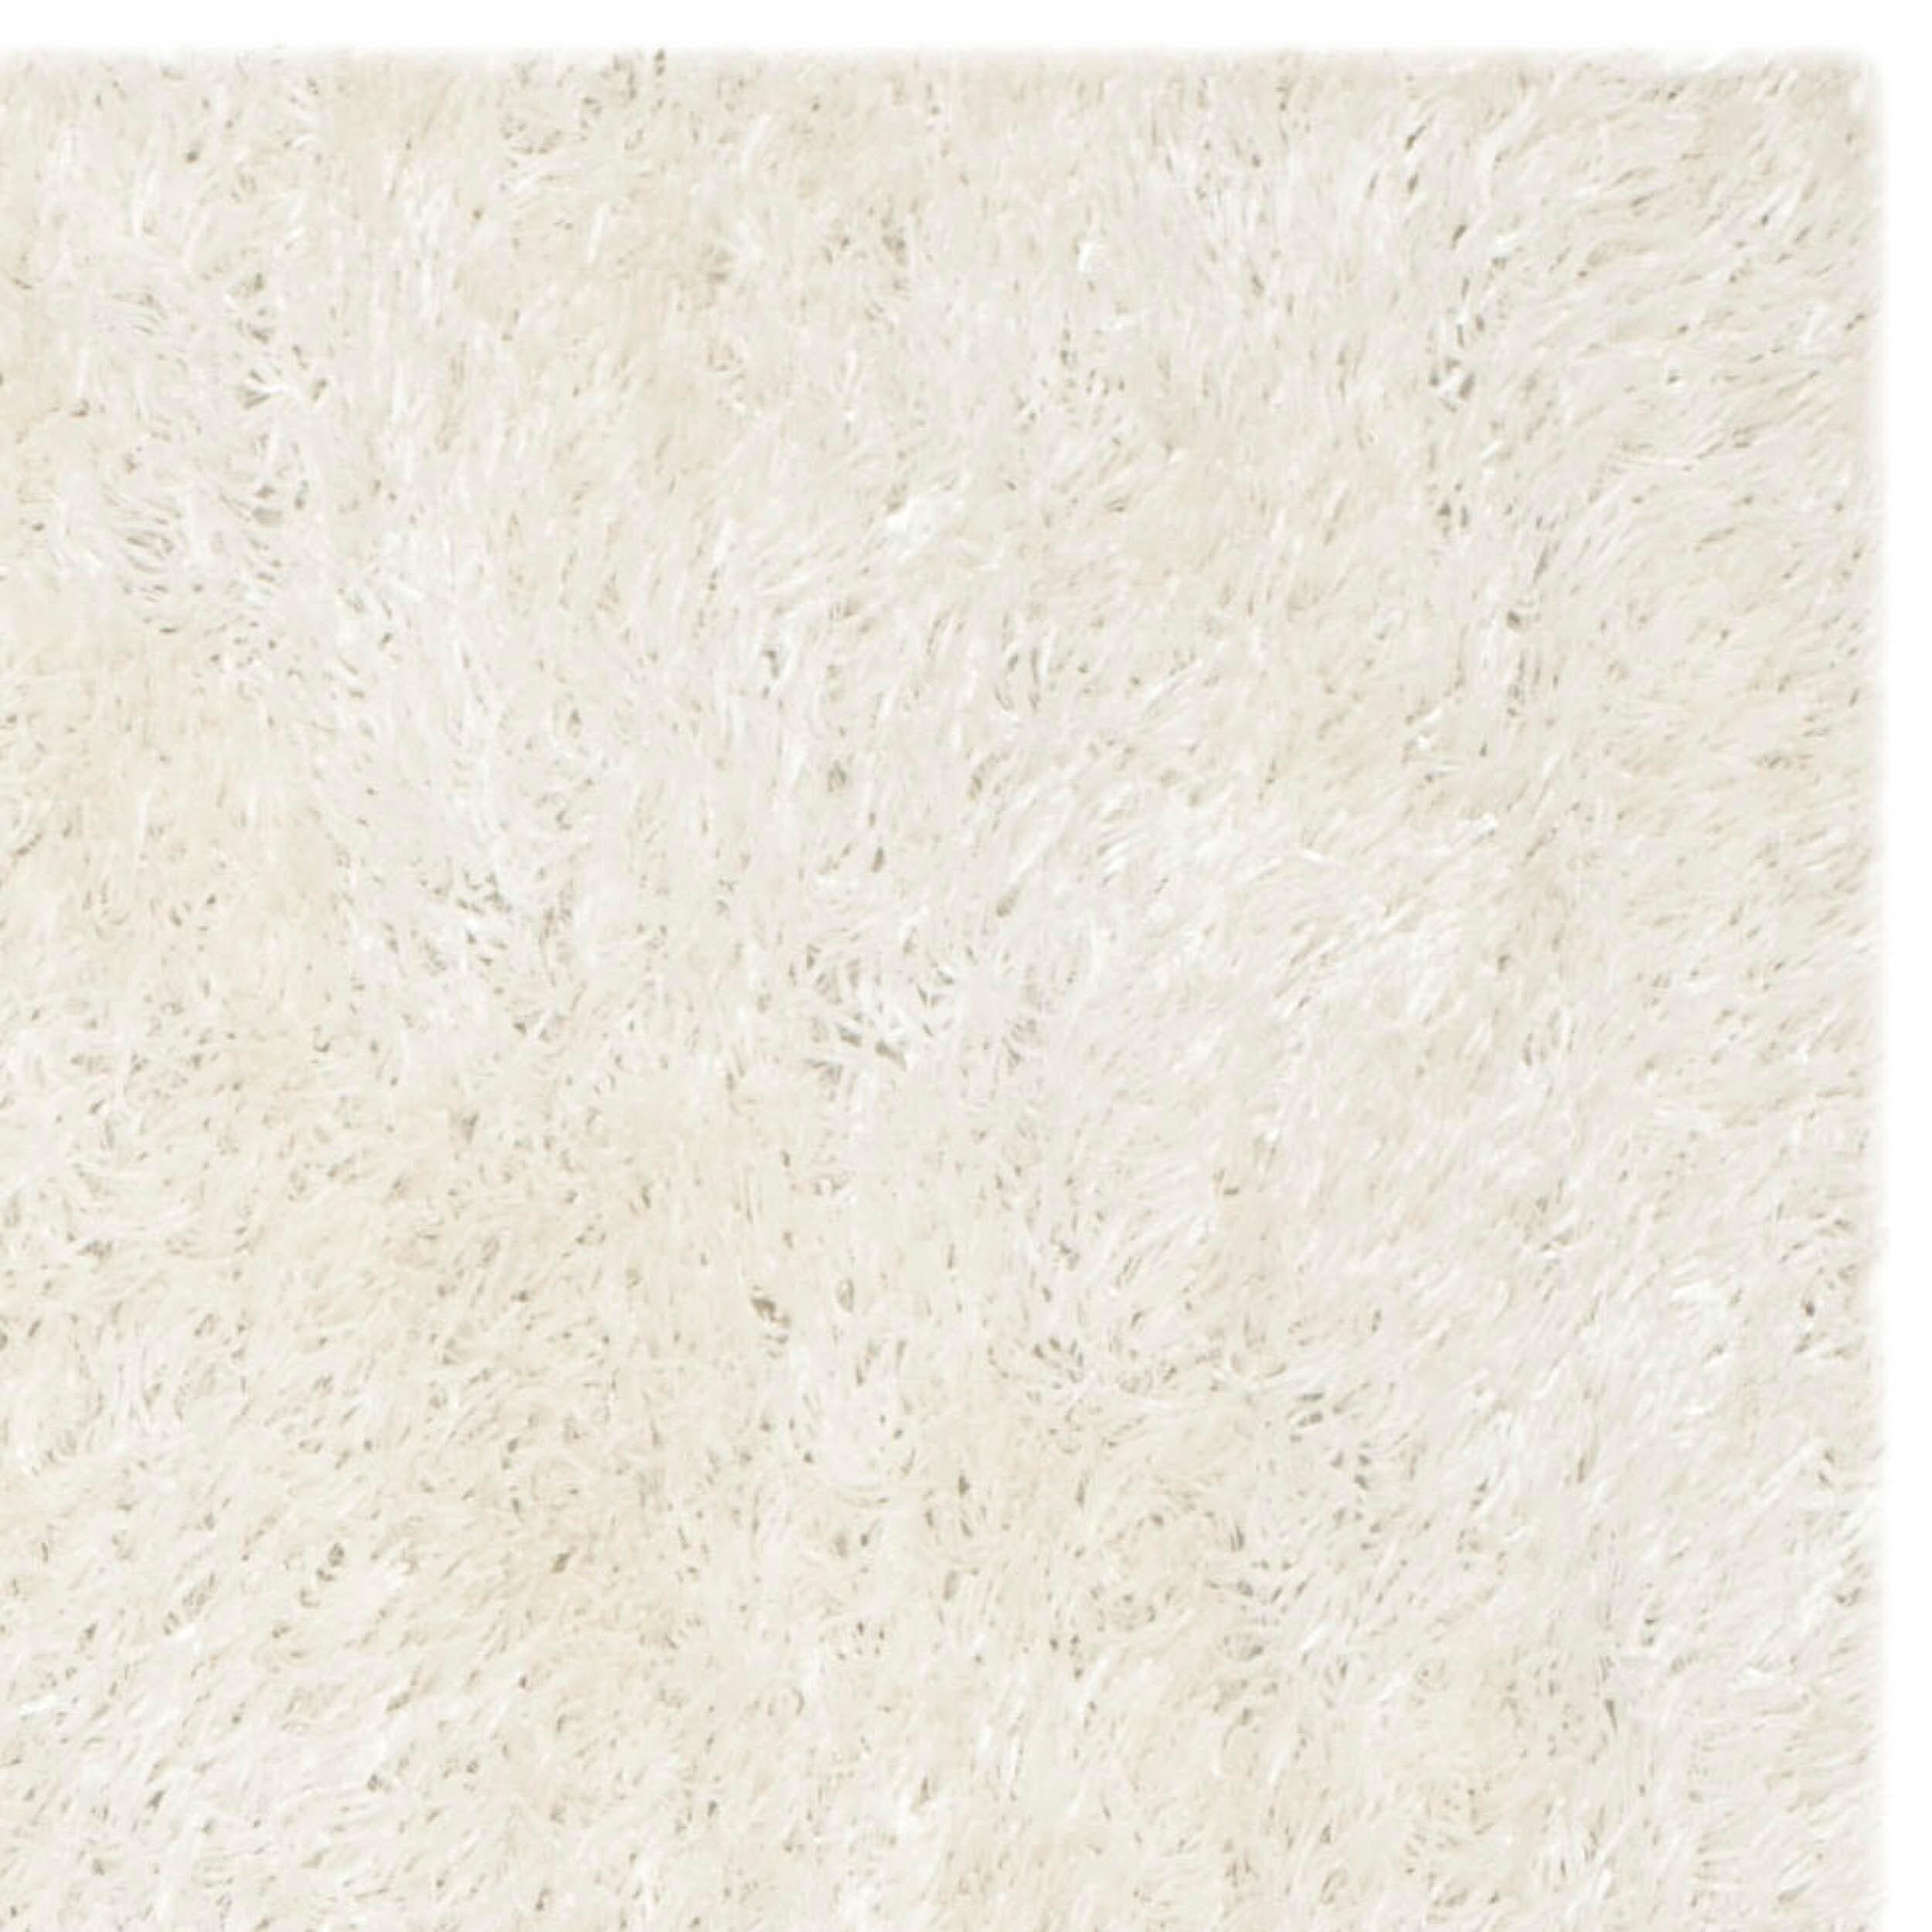 Shop Safavieh Handmade New Orleans Shag Off White Textured Polyester Area Rug